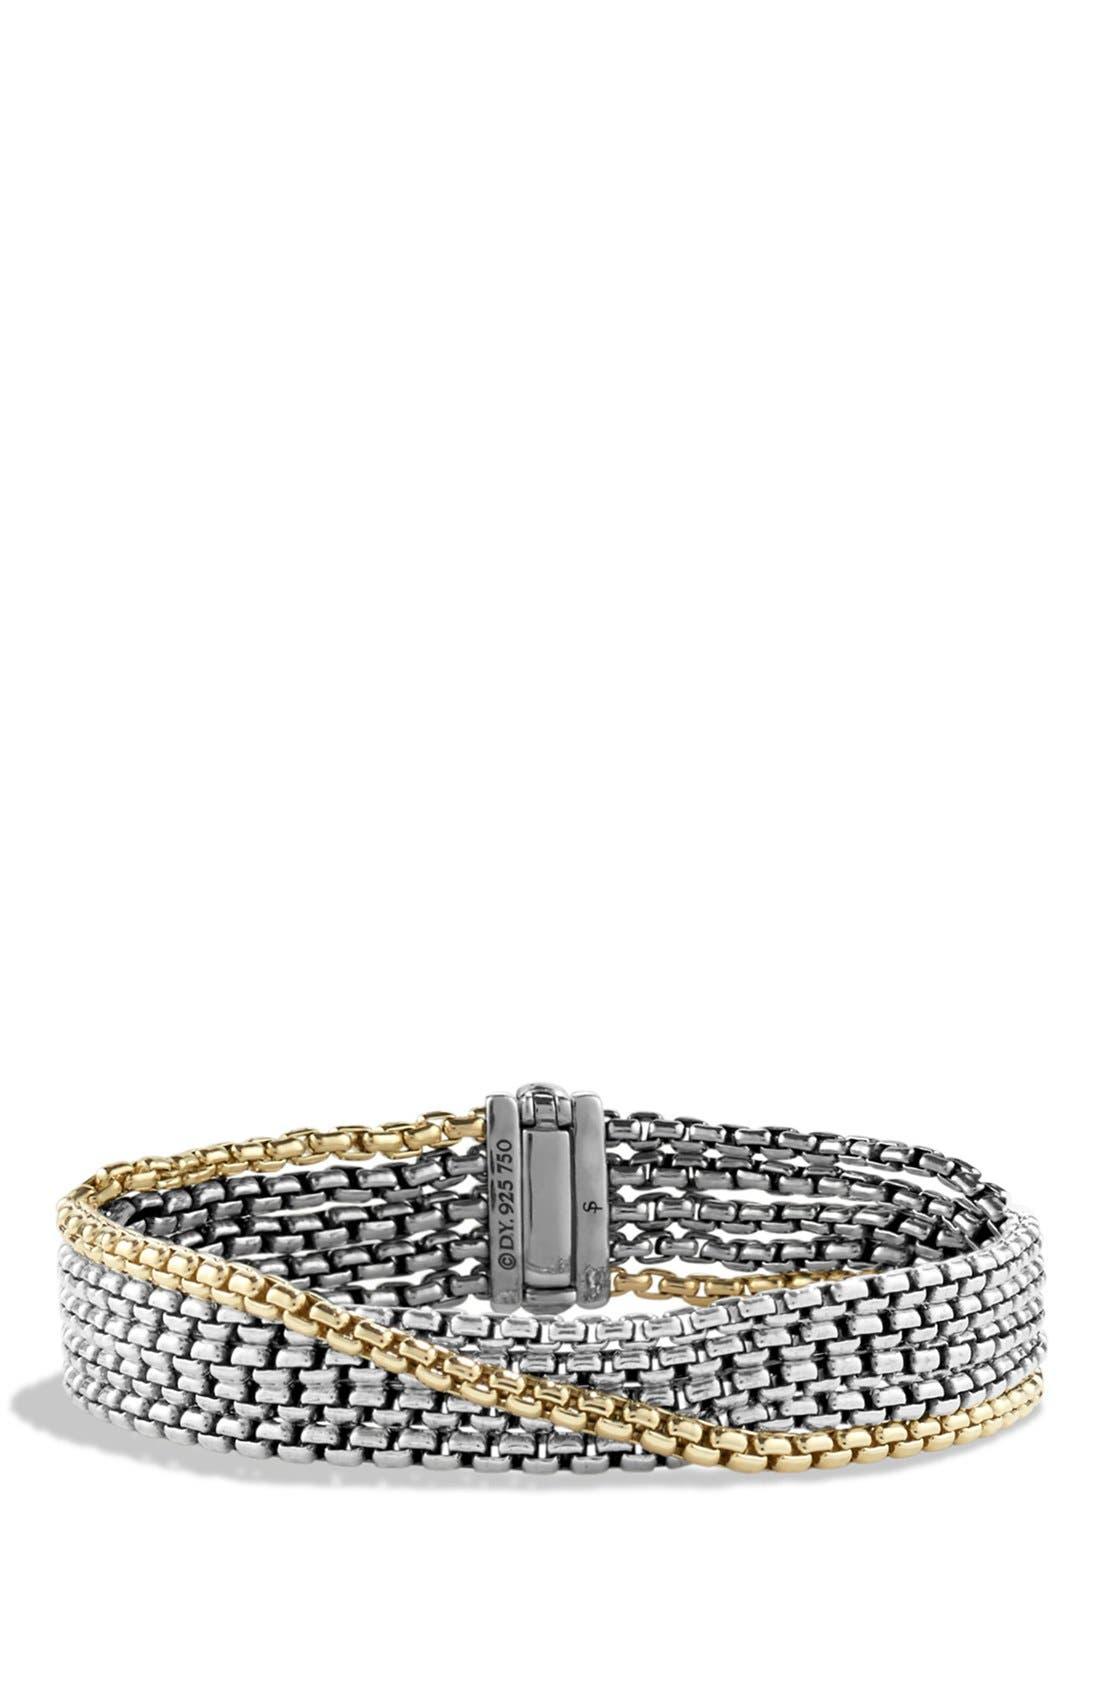 DAVID YURMAN 'Chain' Box Chain Five-Row Bracelet with